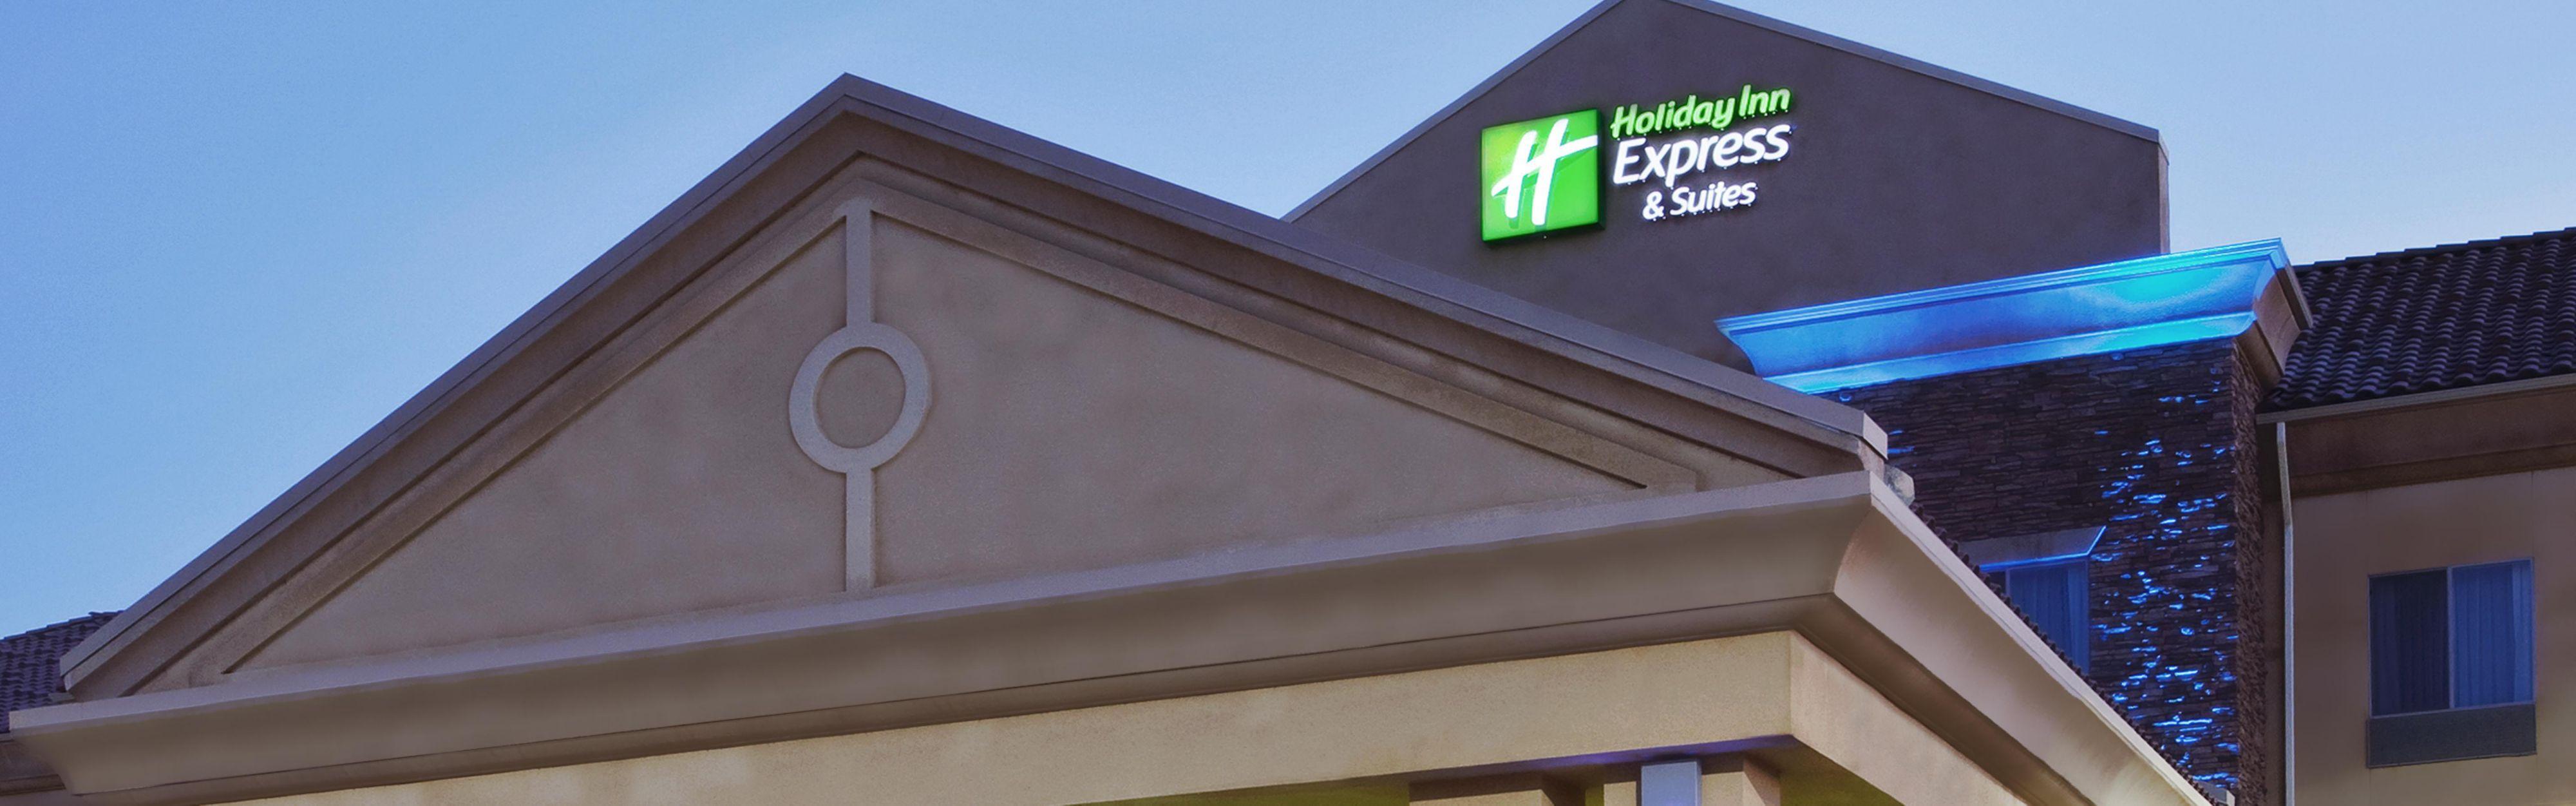 Holiday Inn Express & Suites Merced - Yosemite Natl Pk Area image 0